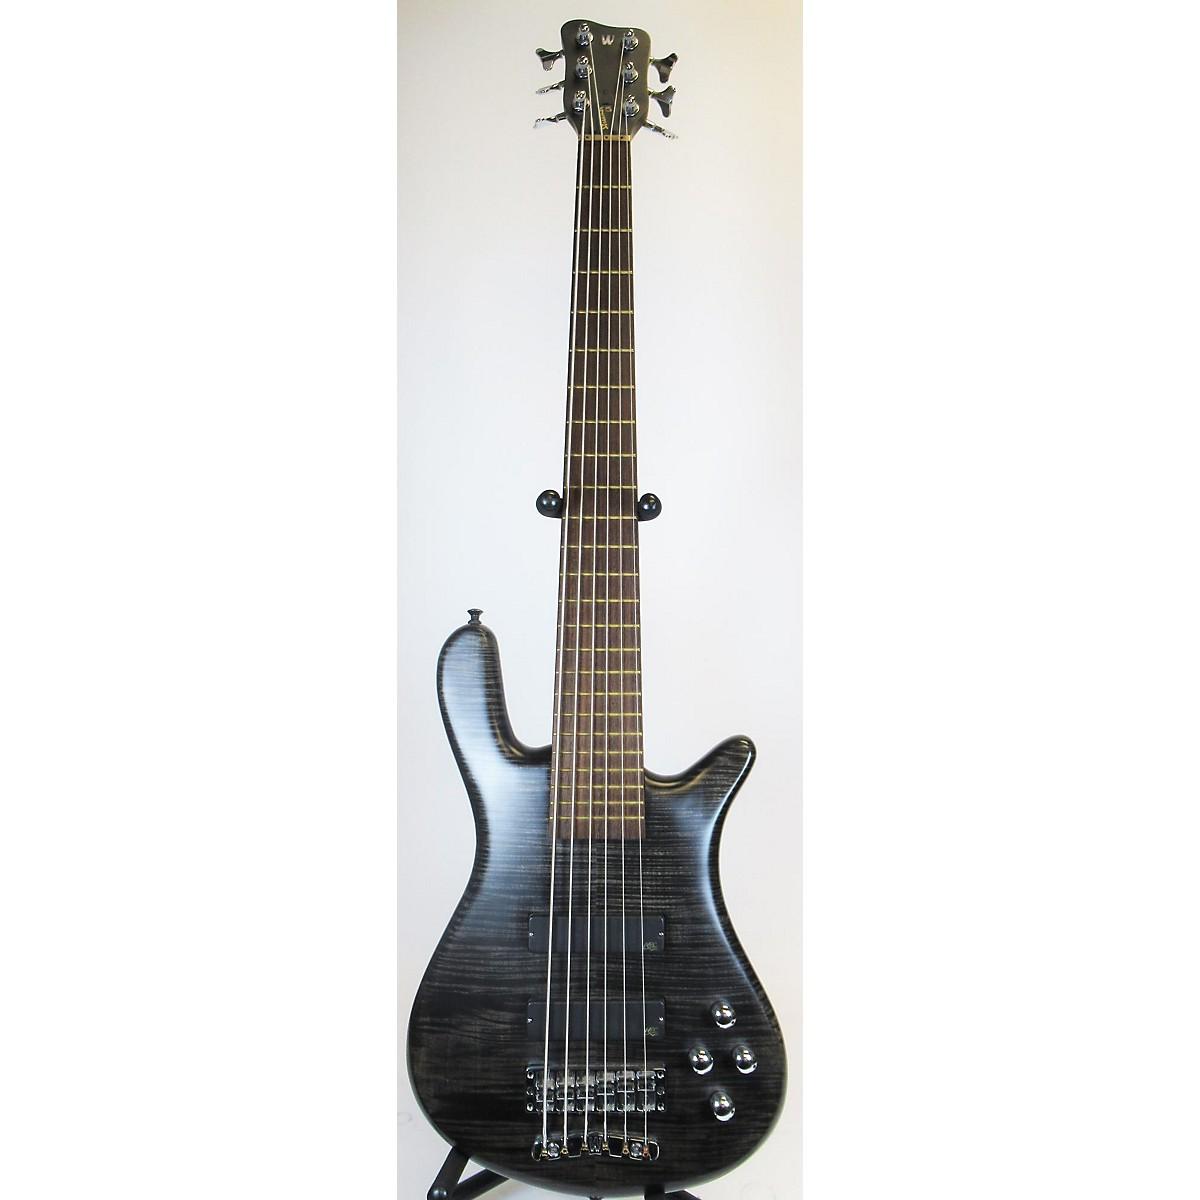 Warwick STREAMER LX6 BUBINGA Electric Bass Guitar